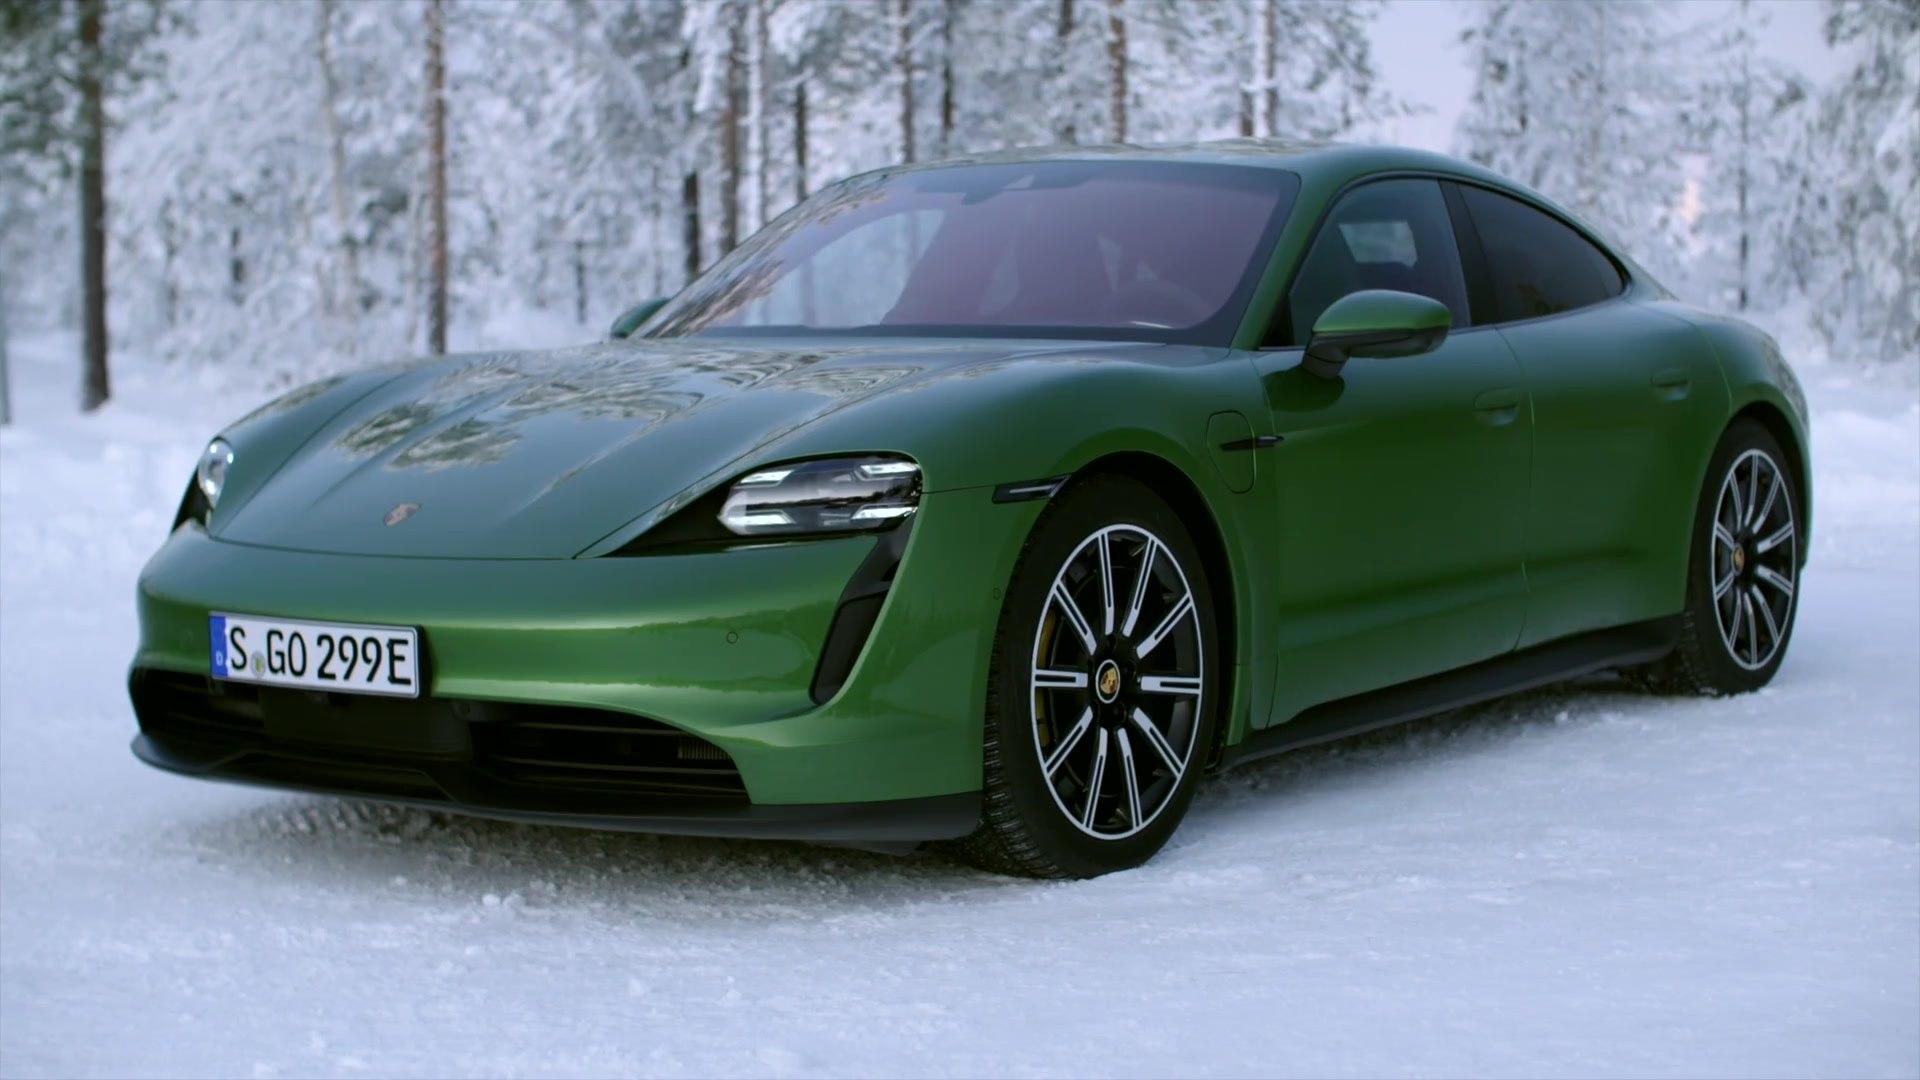 Porsche Taycan 4s Design In Mamba Green Video Dailymotion